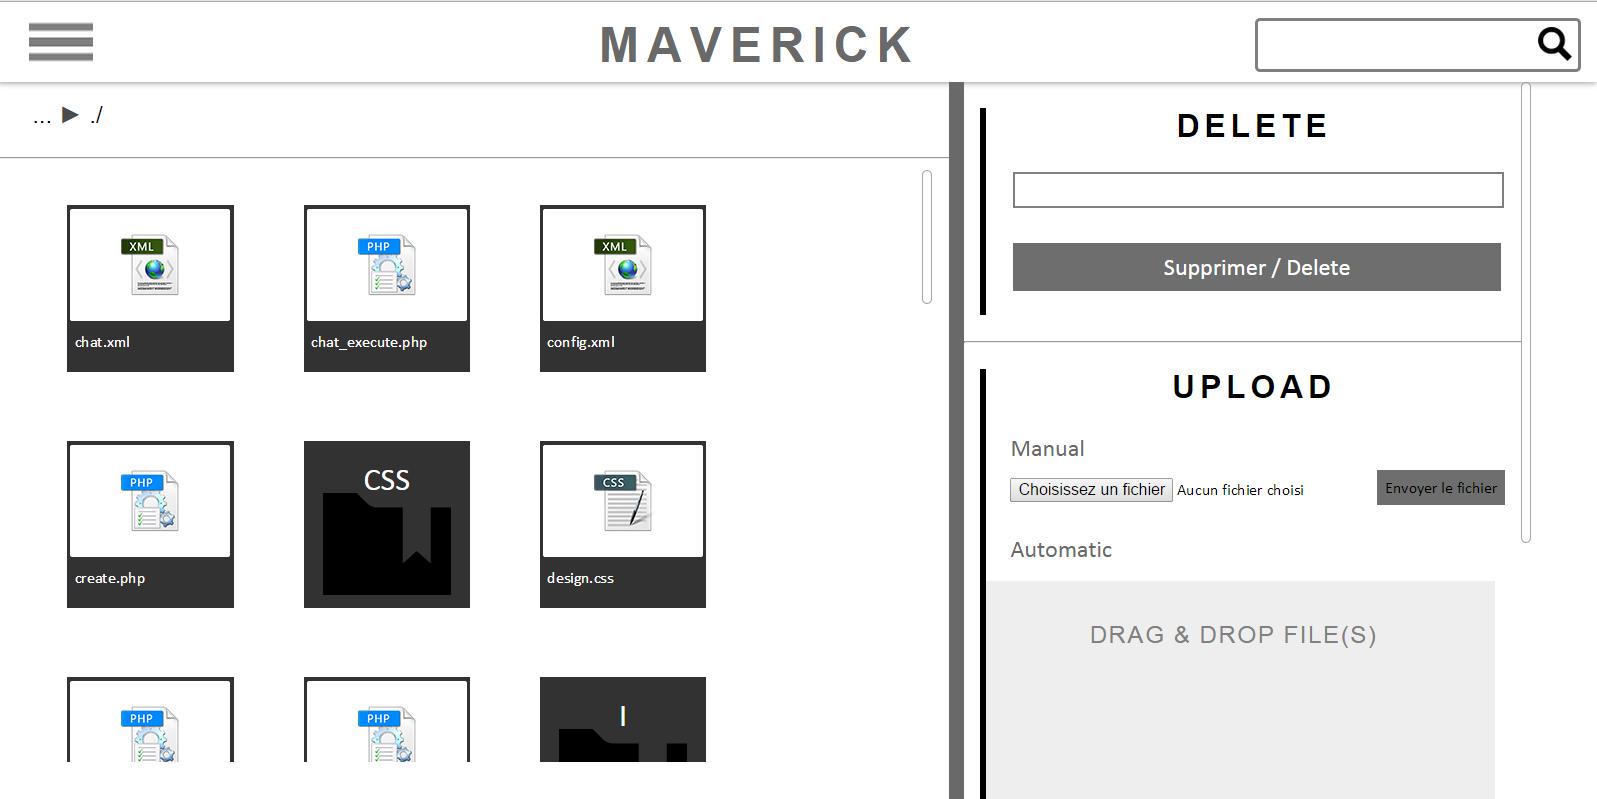 Maverick - Cloud storage website - 1